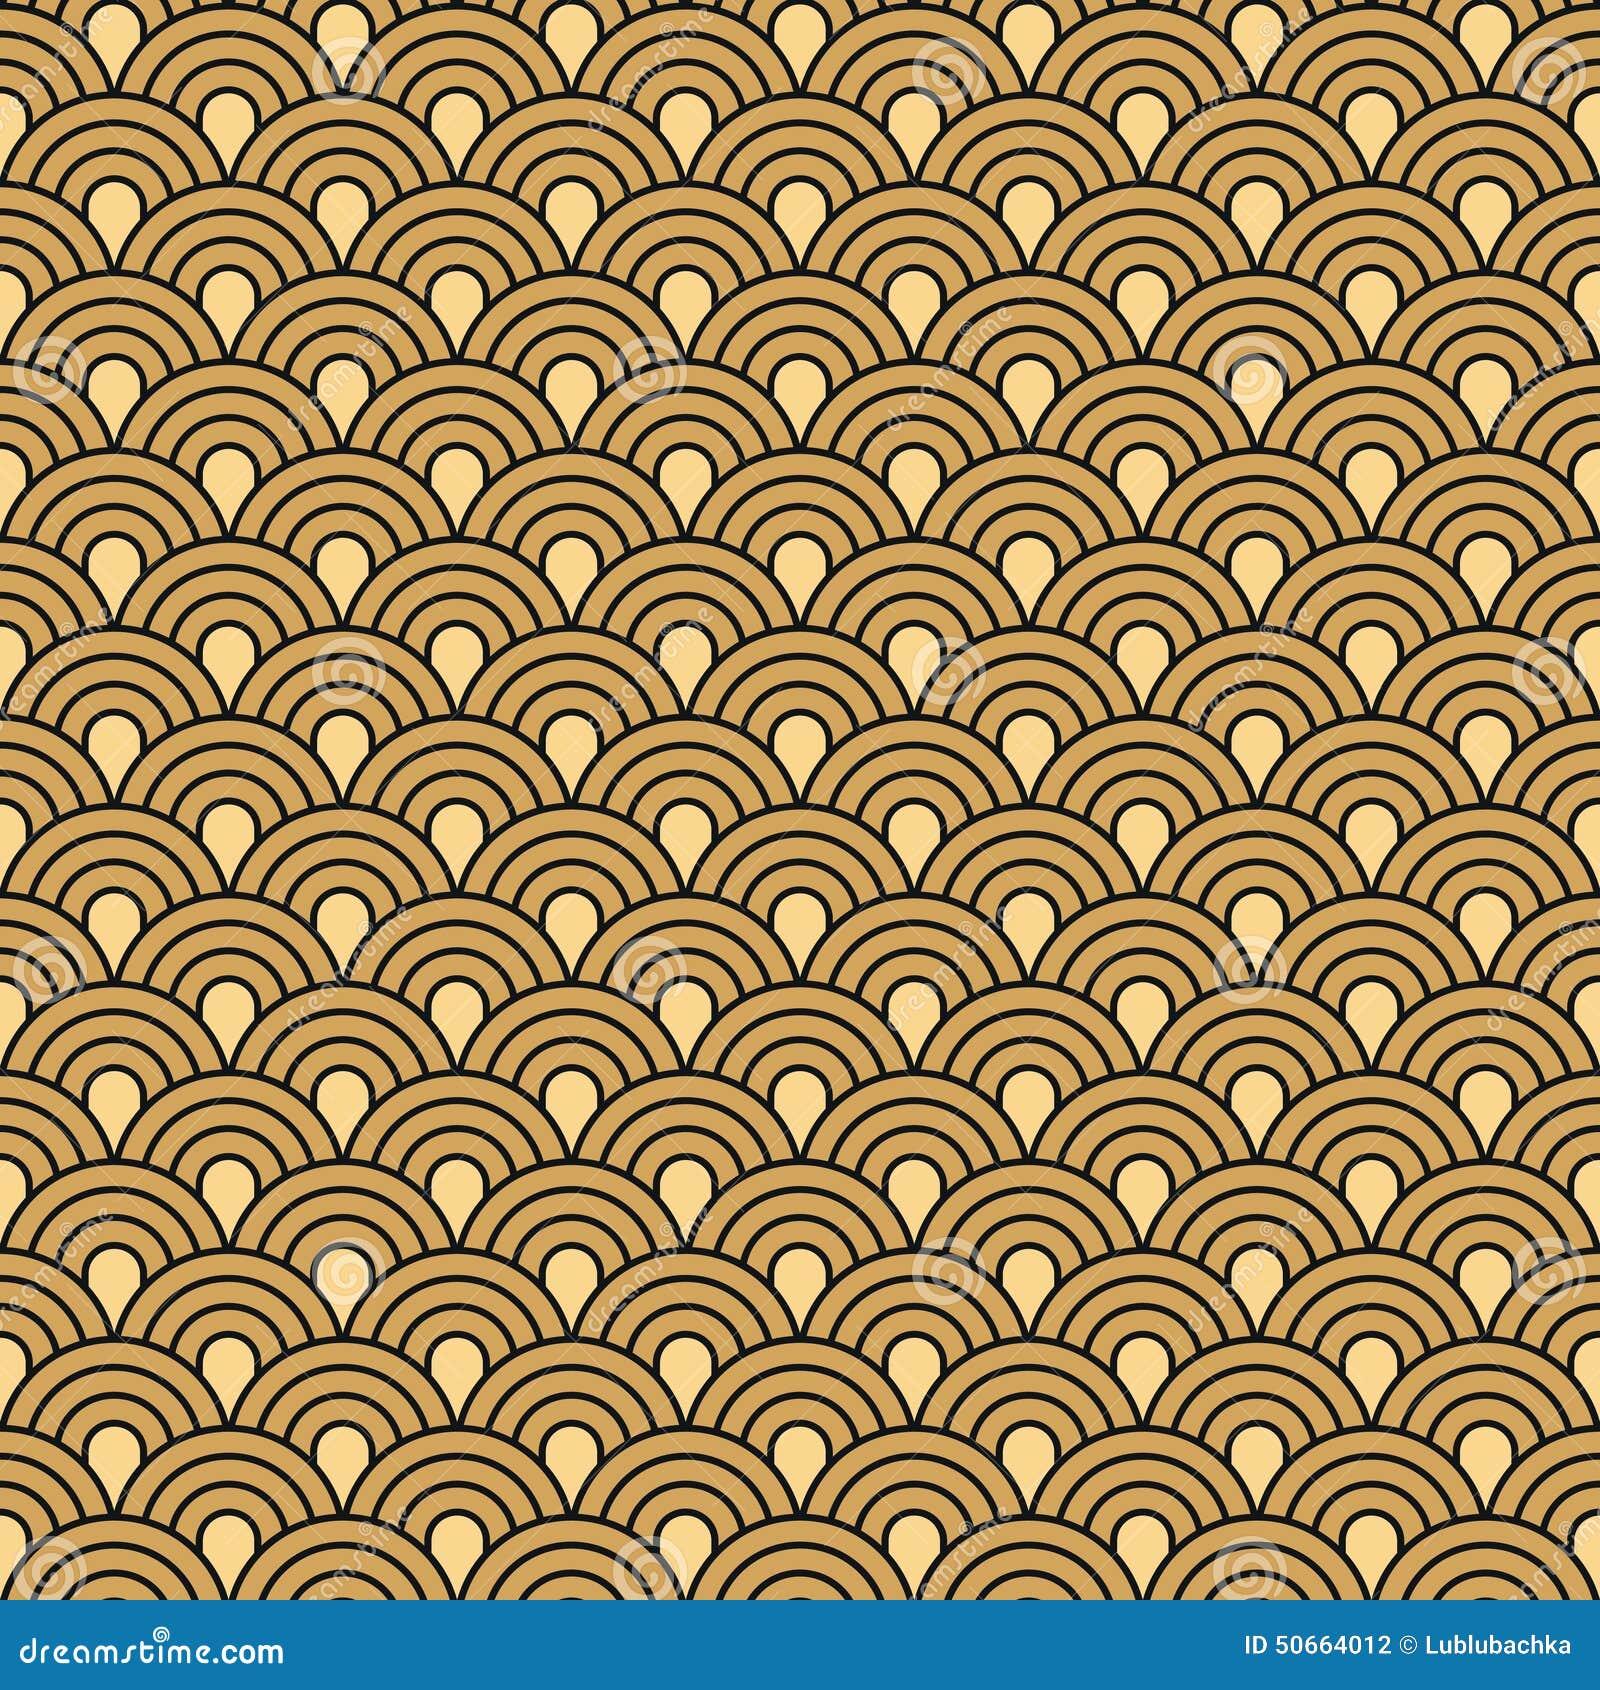 Art Deco Seamless Vintage Wallpaper Pattern Stock Vector